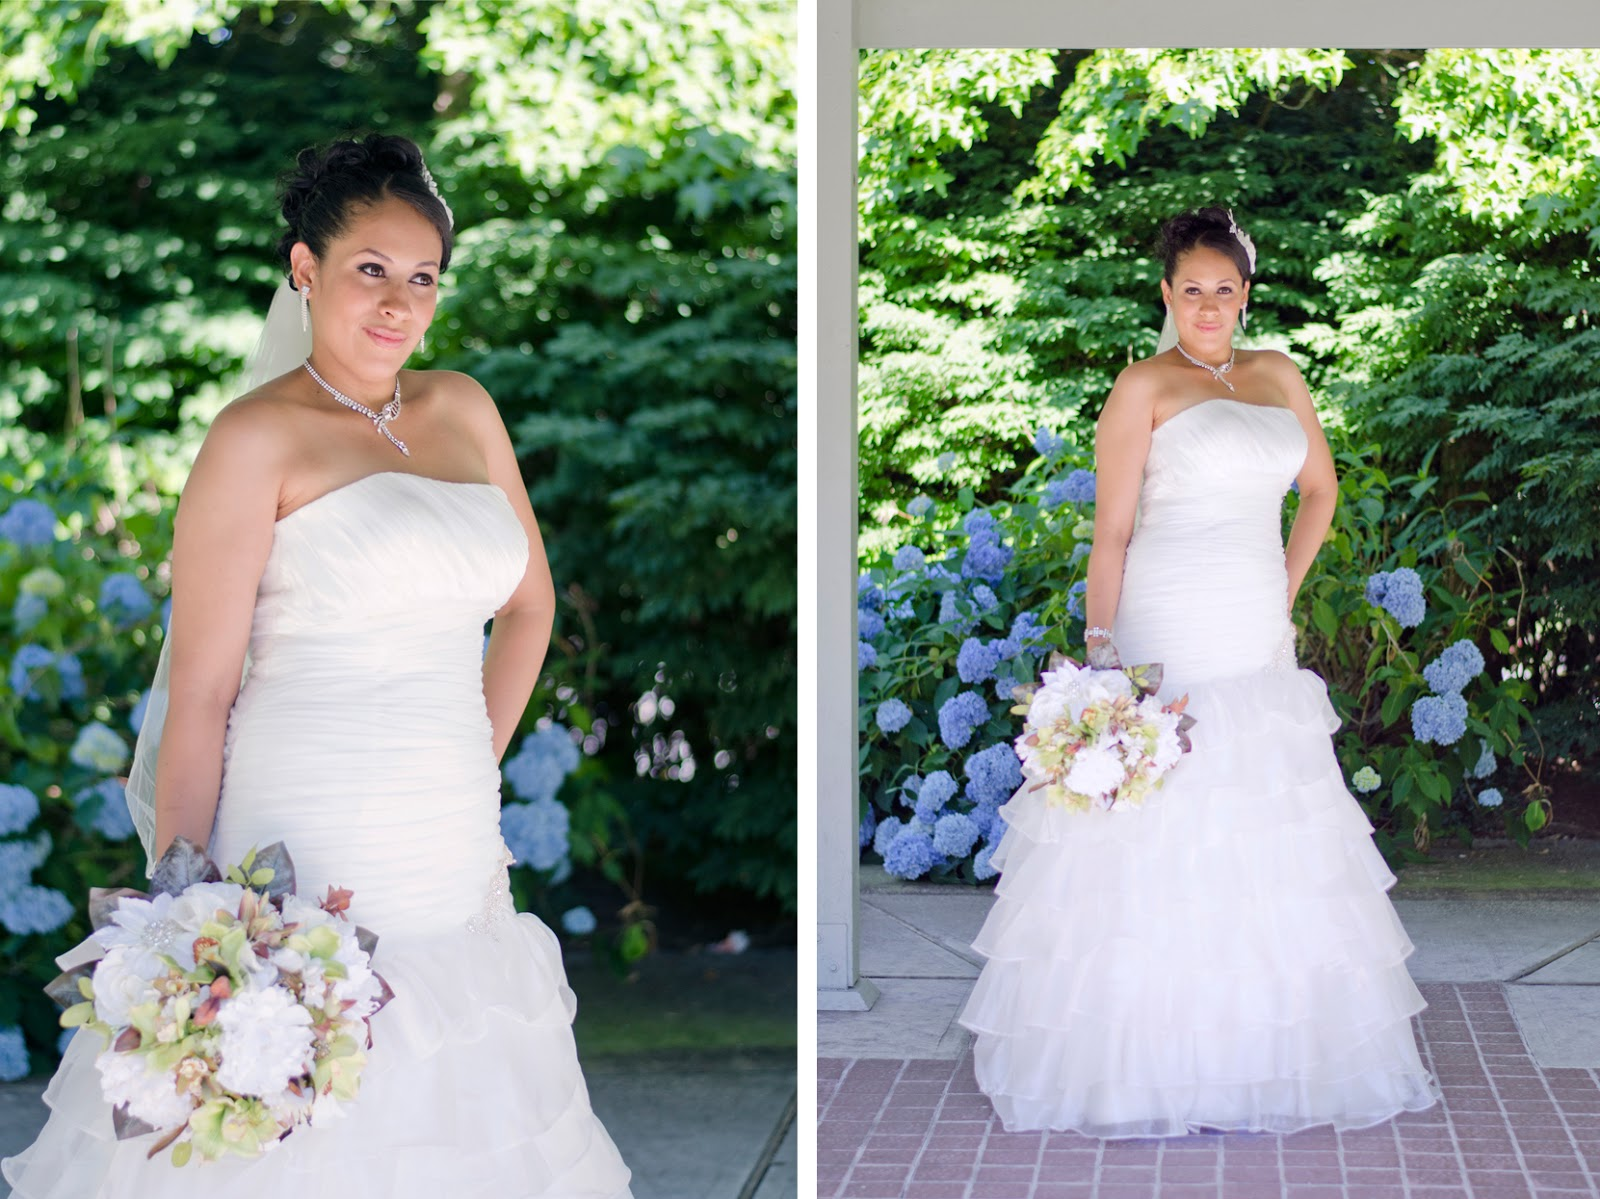 Bonson_community_Centre_wedding_11.jpg